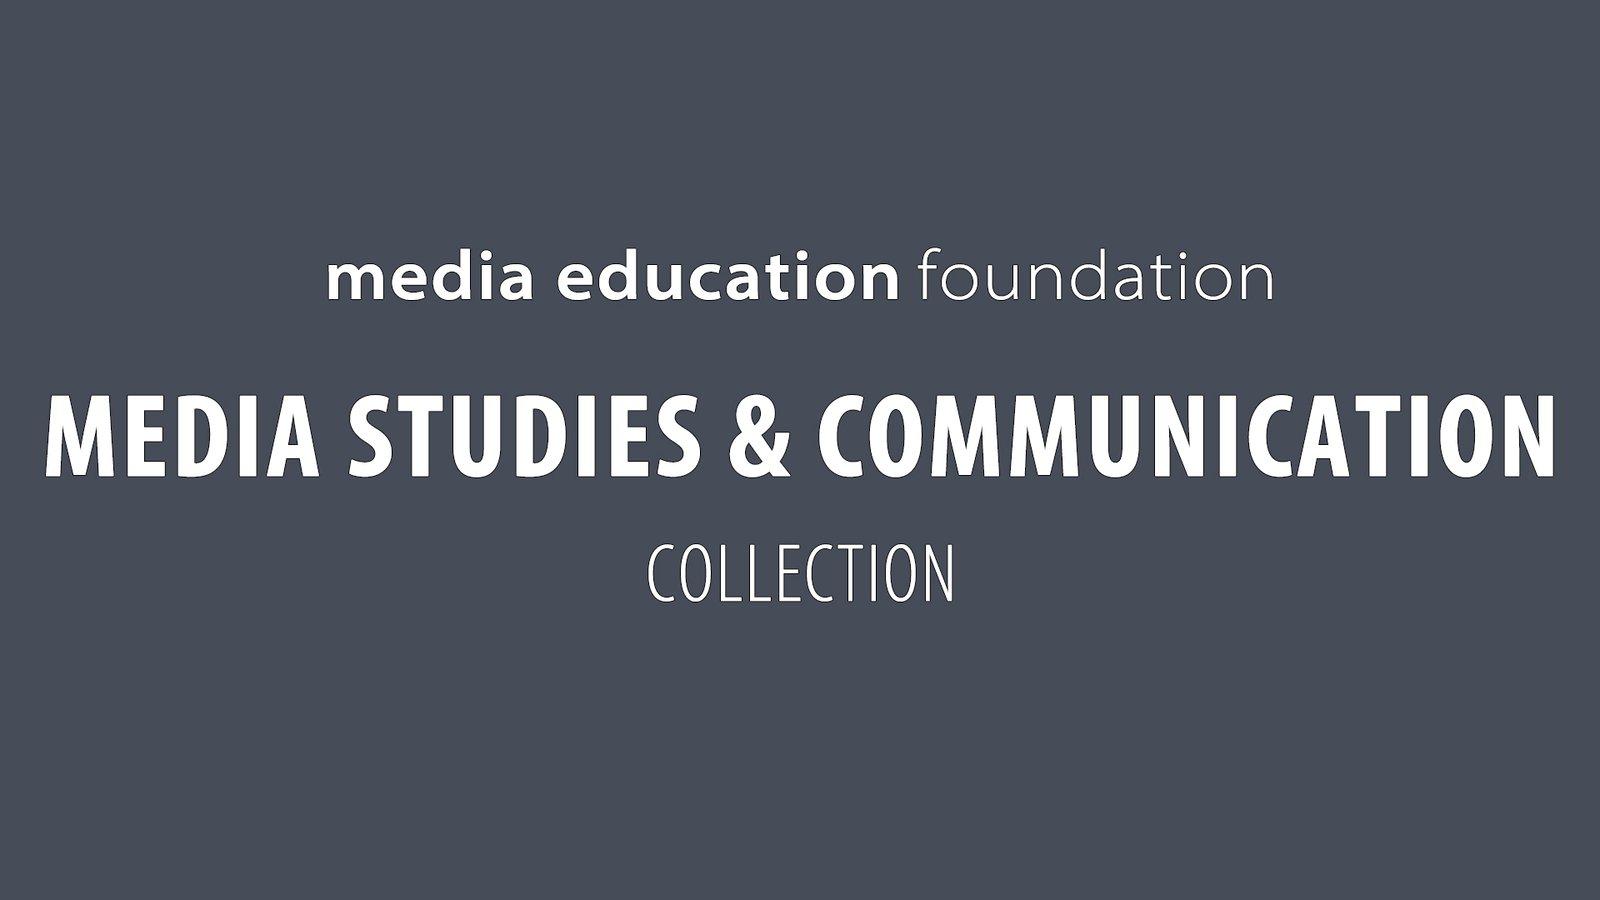 MEF Media Studies & Communication Collection